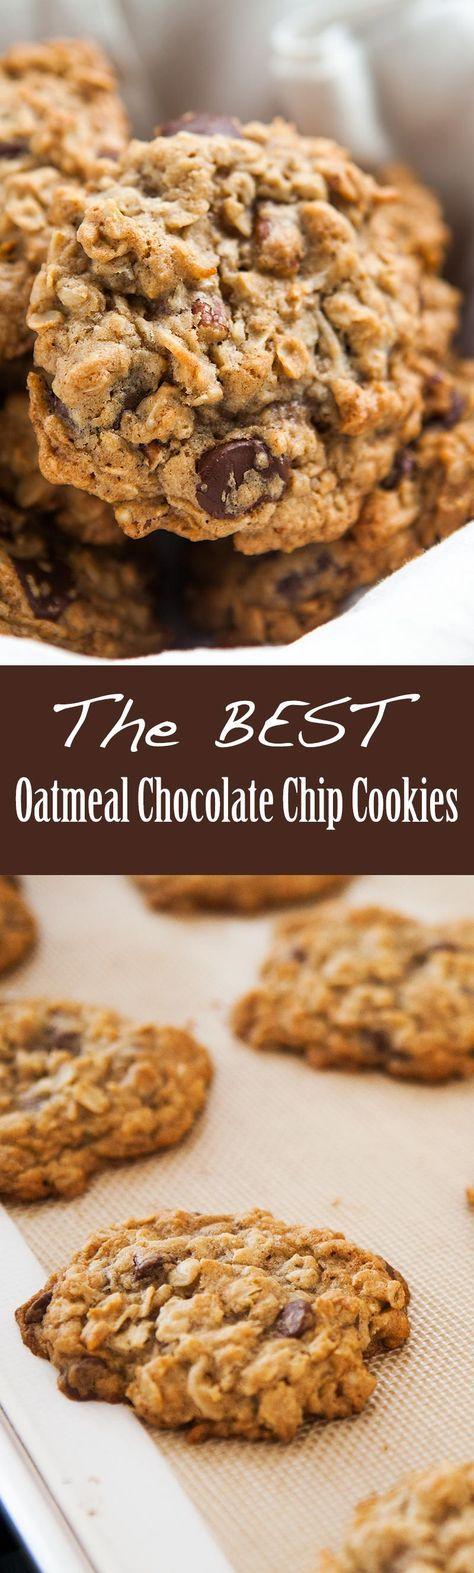 25+ best ideas about Best oatmeal cookies on Pinterest ...